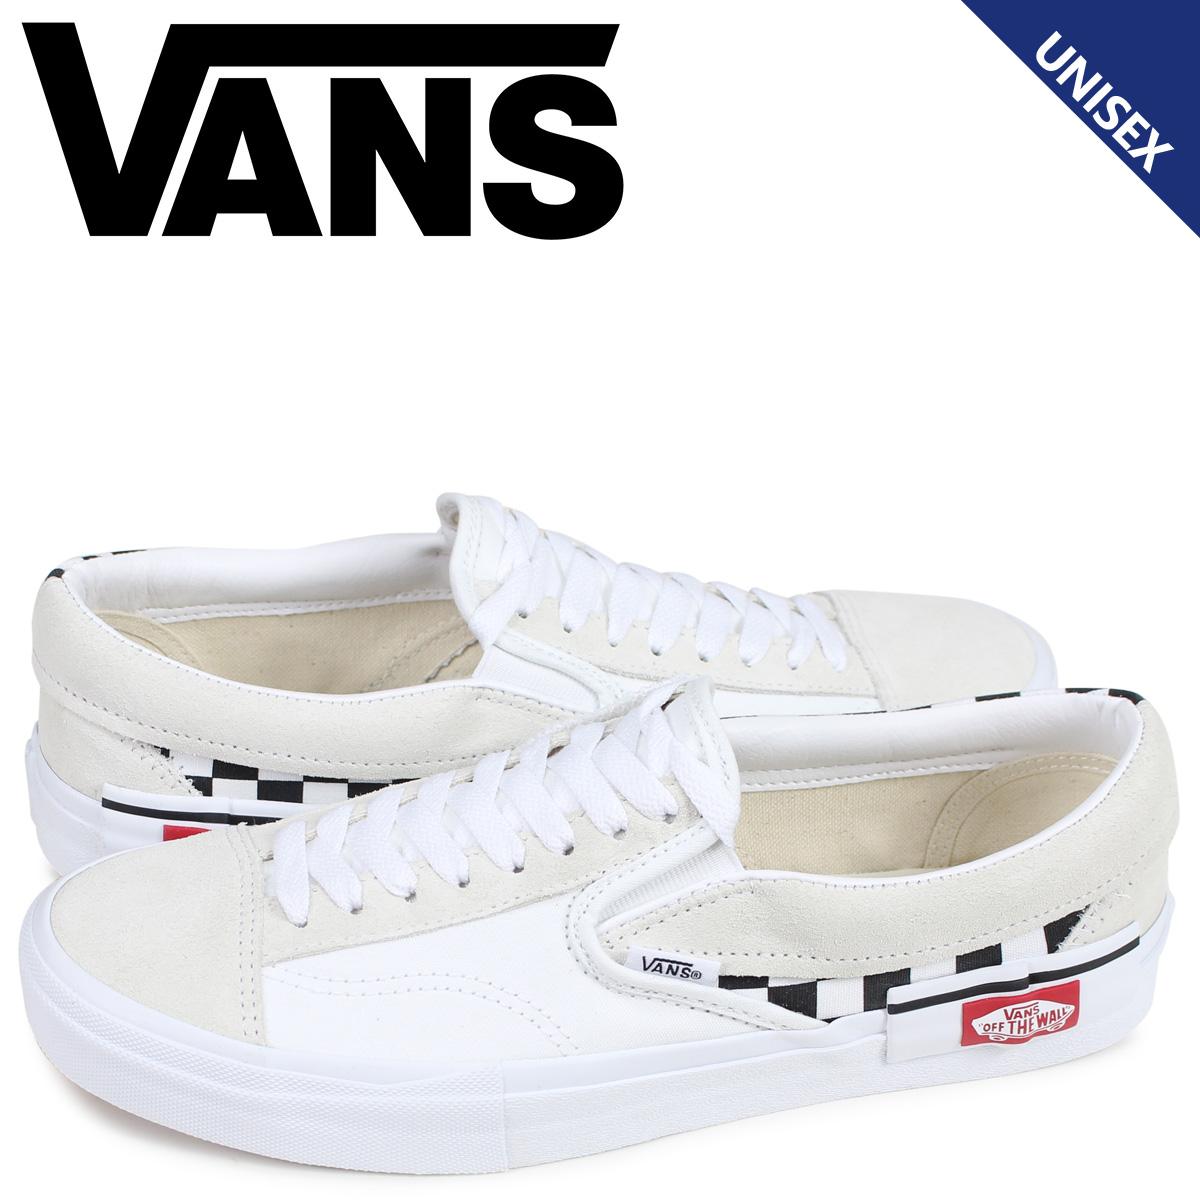 VANS ヴァンズ スリッポン スニーカー メンズ バンズ SLIP-ON CAP ホワイト 白 VN0A3WM527I